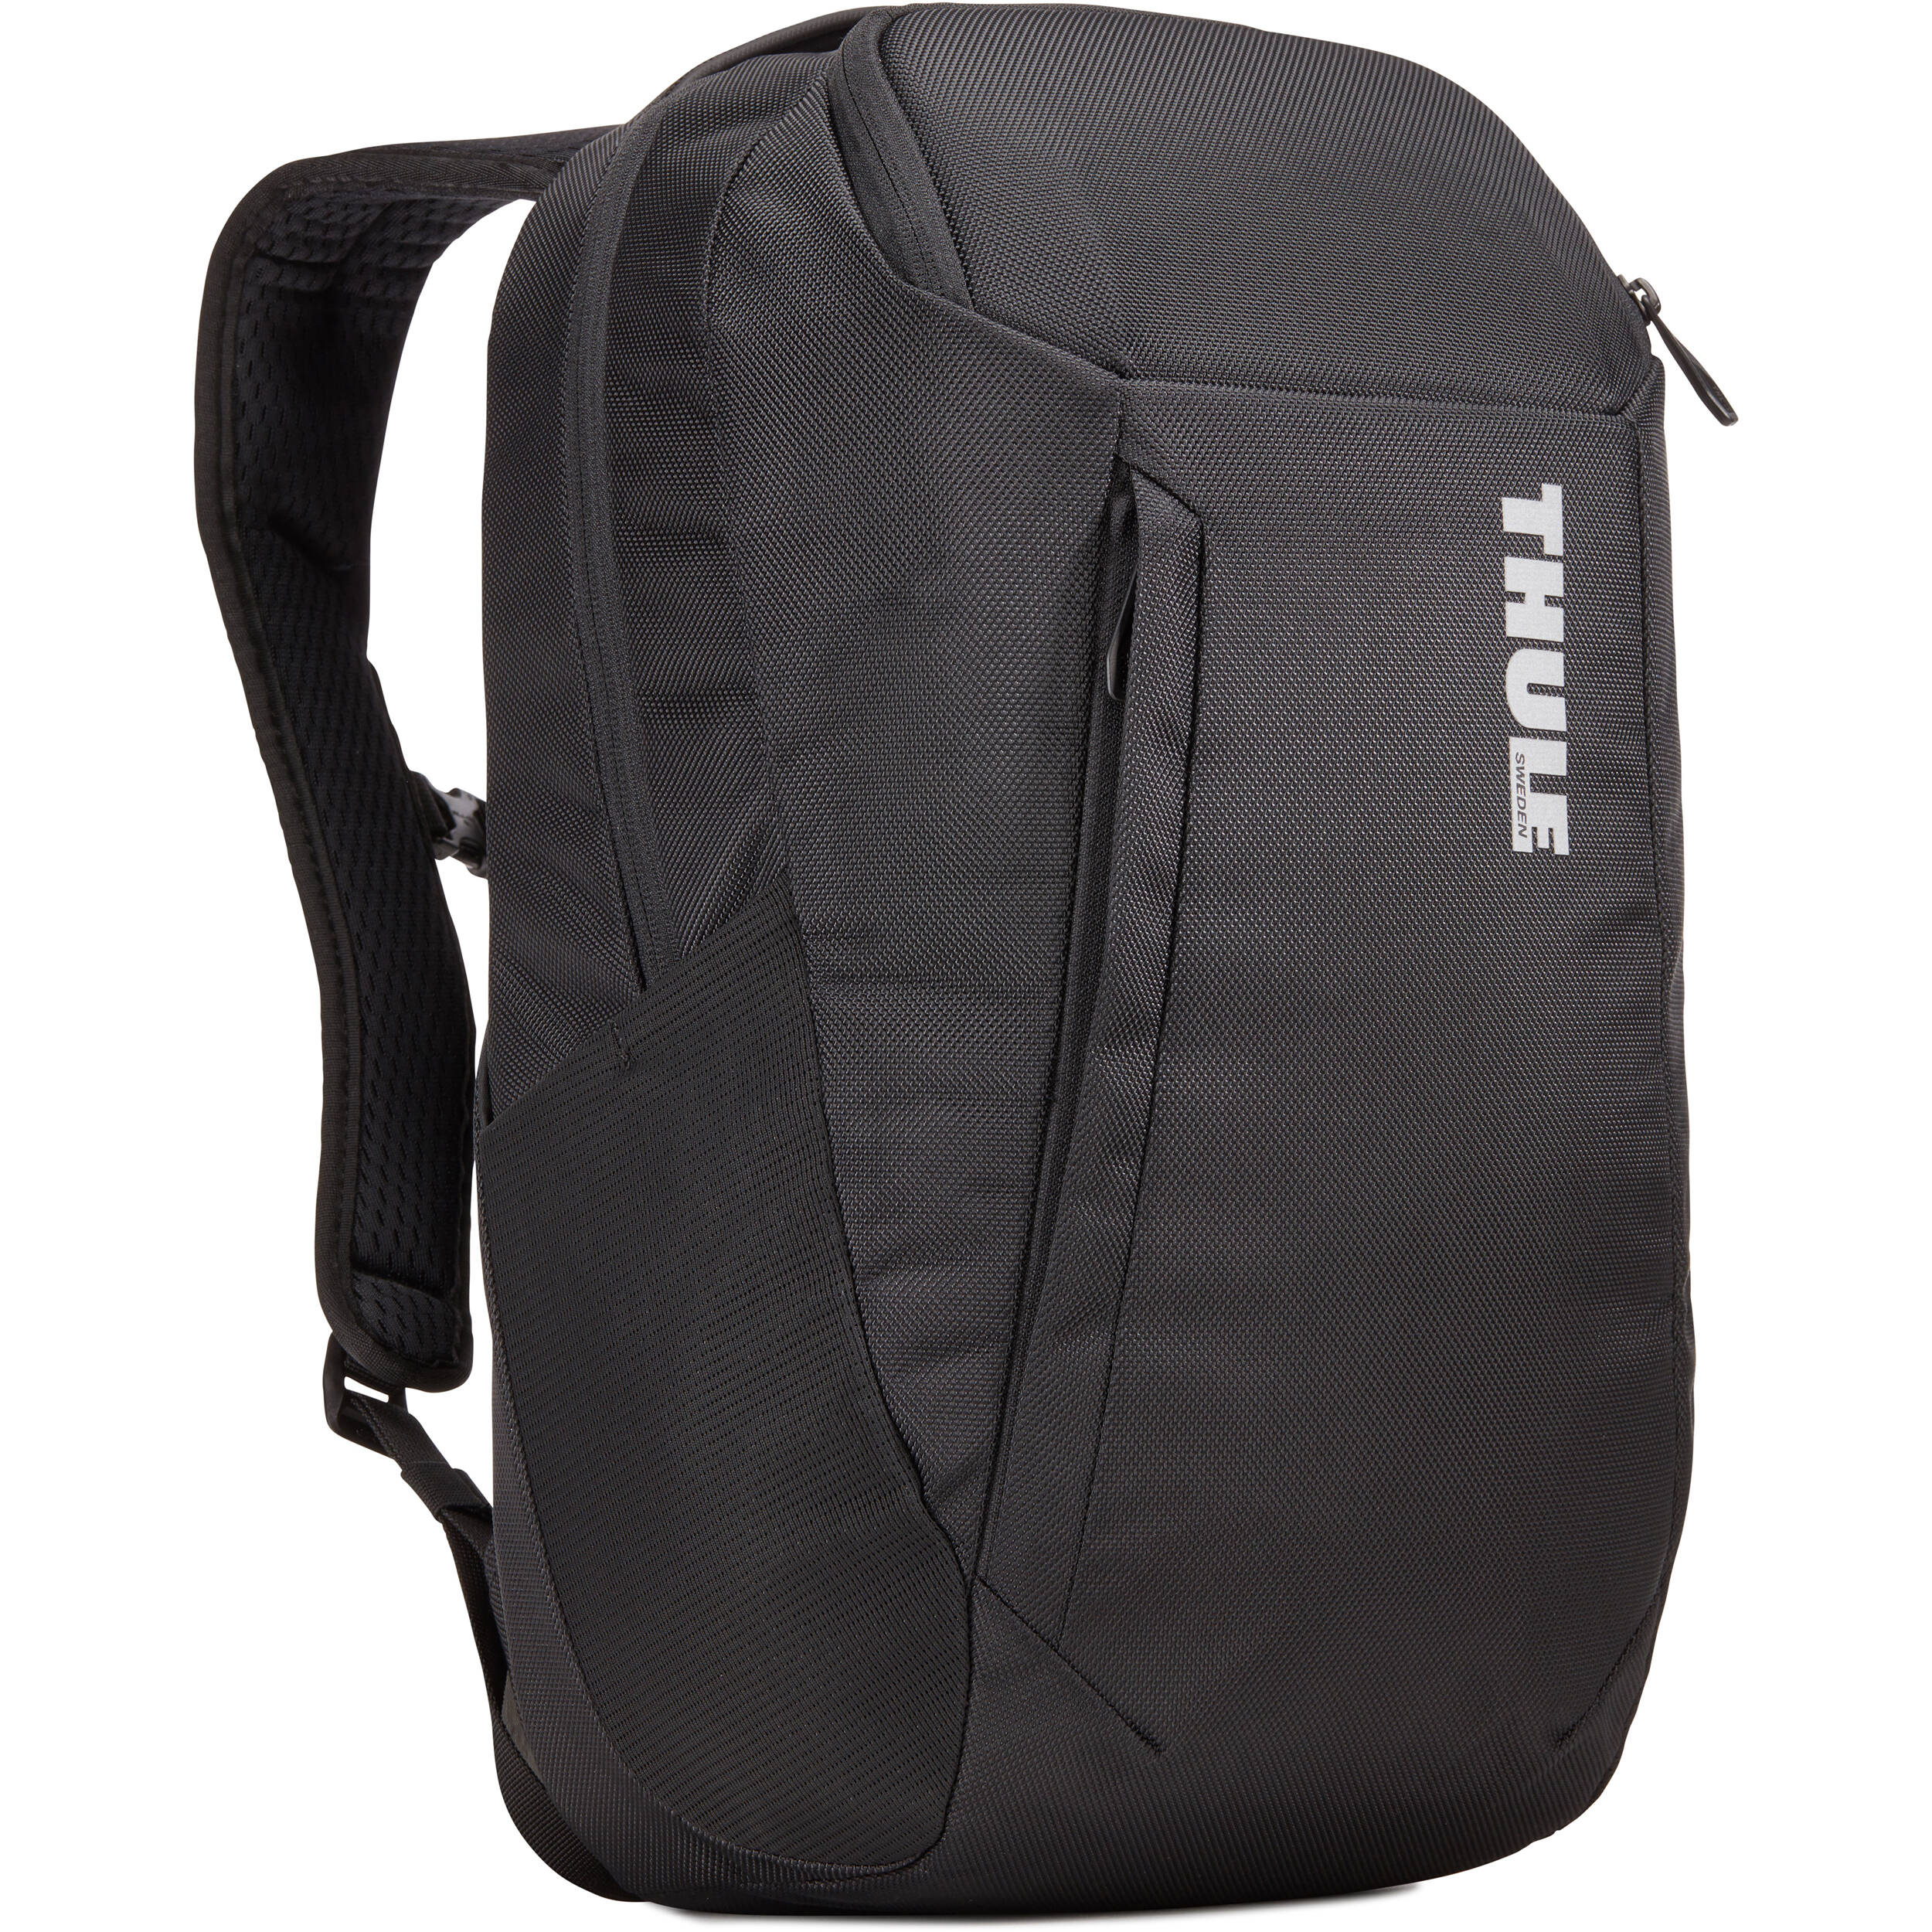 c47821203b25 Thule Accent 20L Backpack (Black) 3203622 B H Photo Video